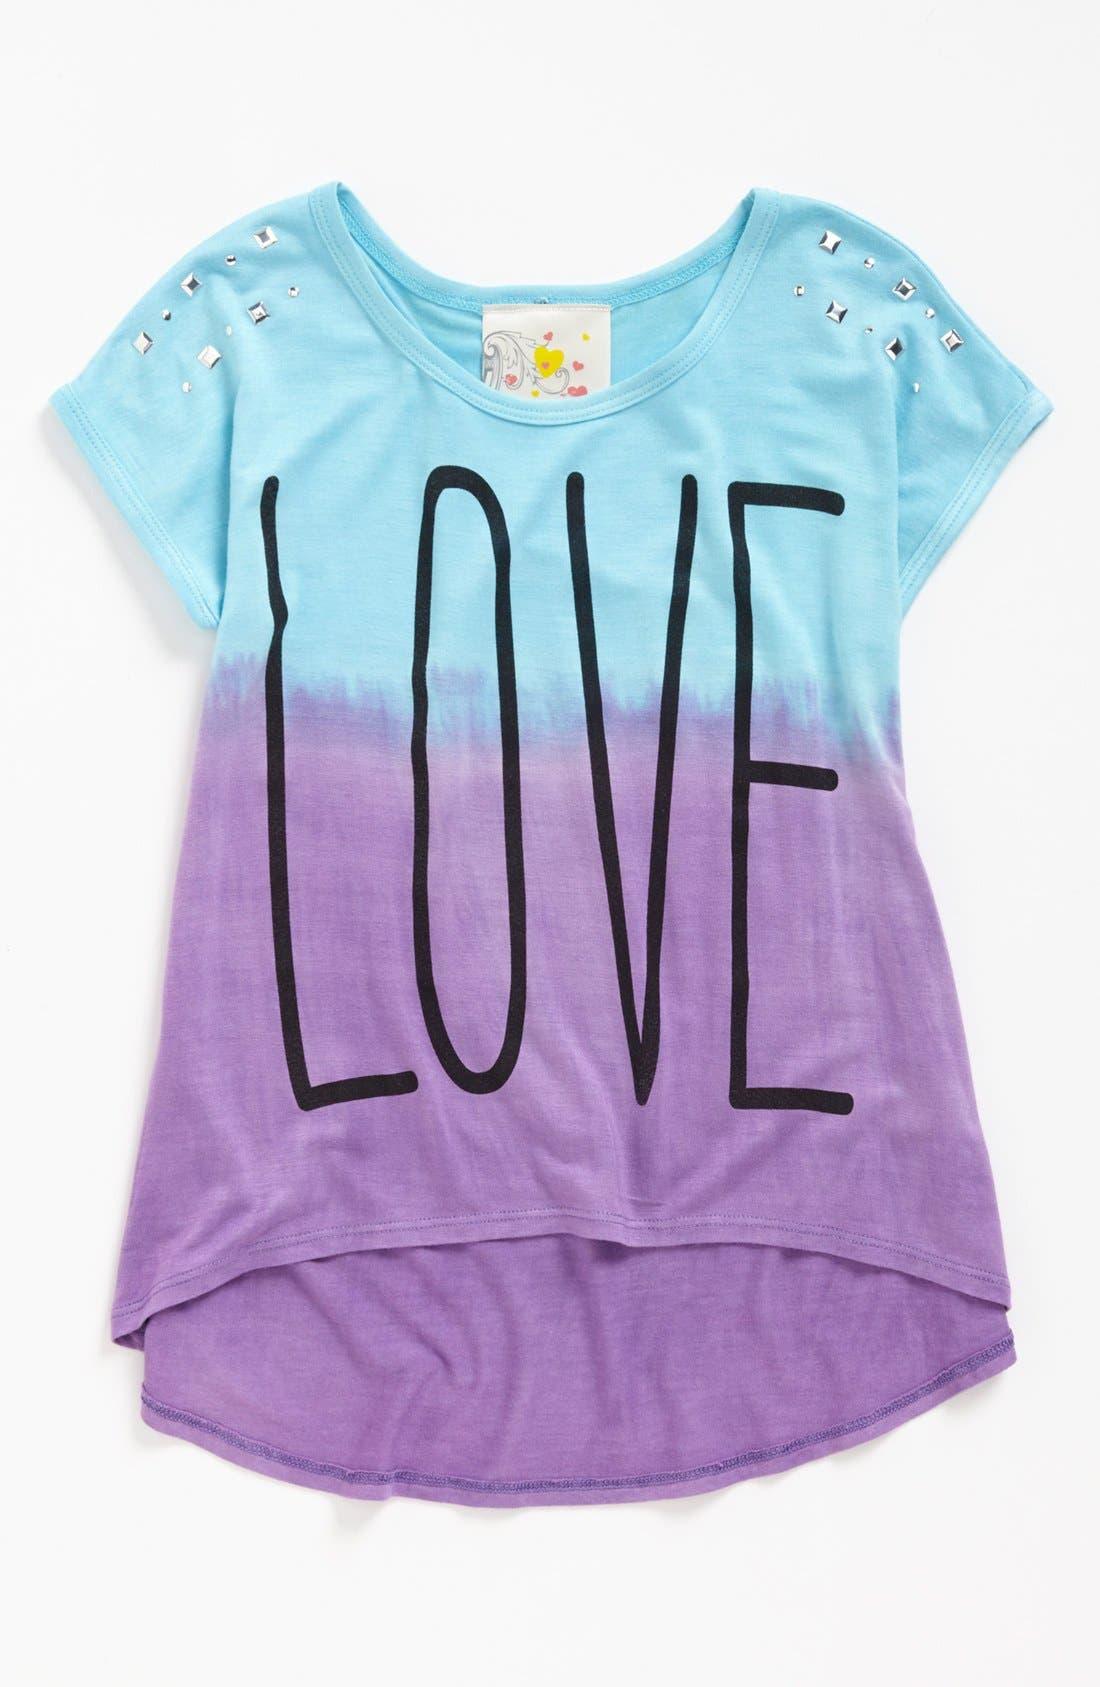 Alternate Image 1 Selected - Jenna & Jessie 'Love' Top (Little Girls)